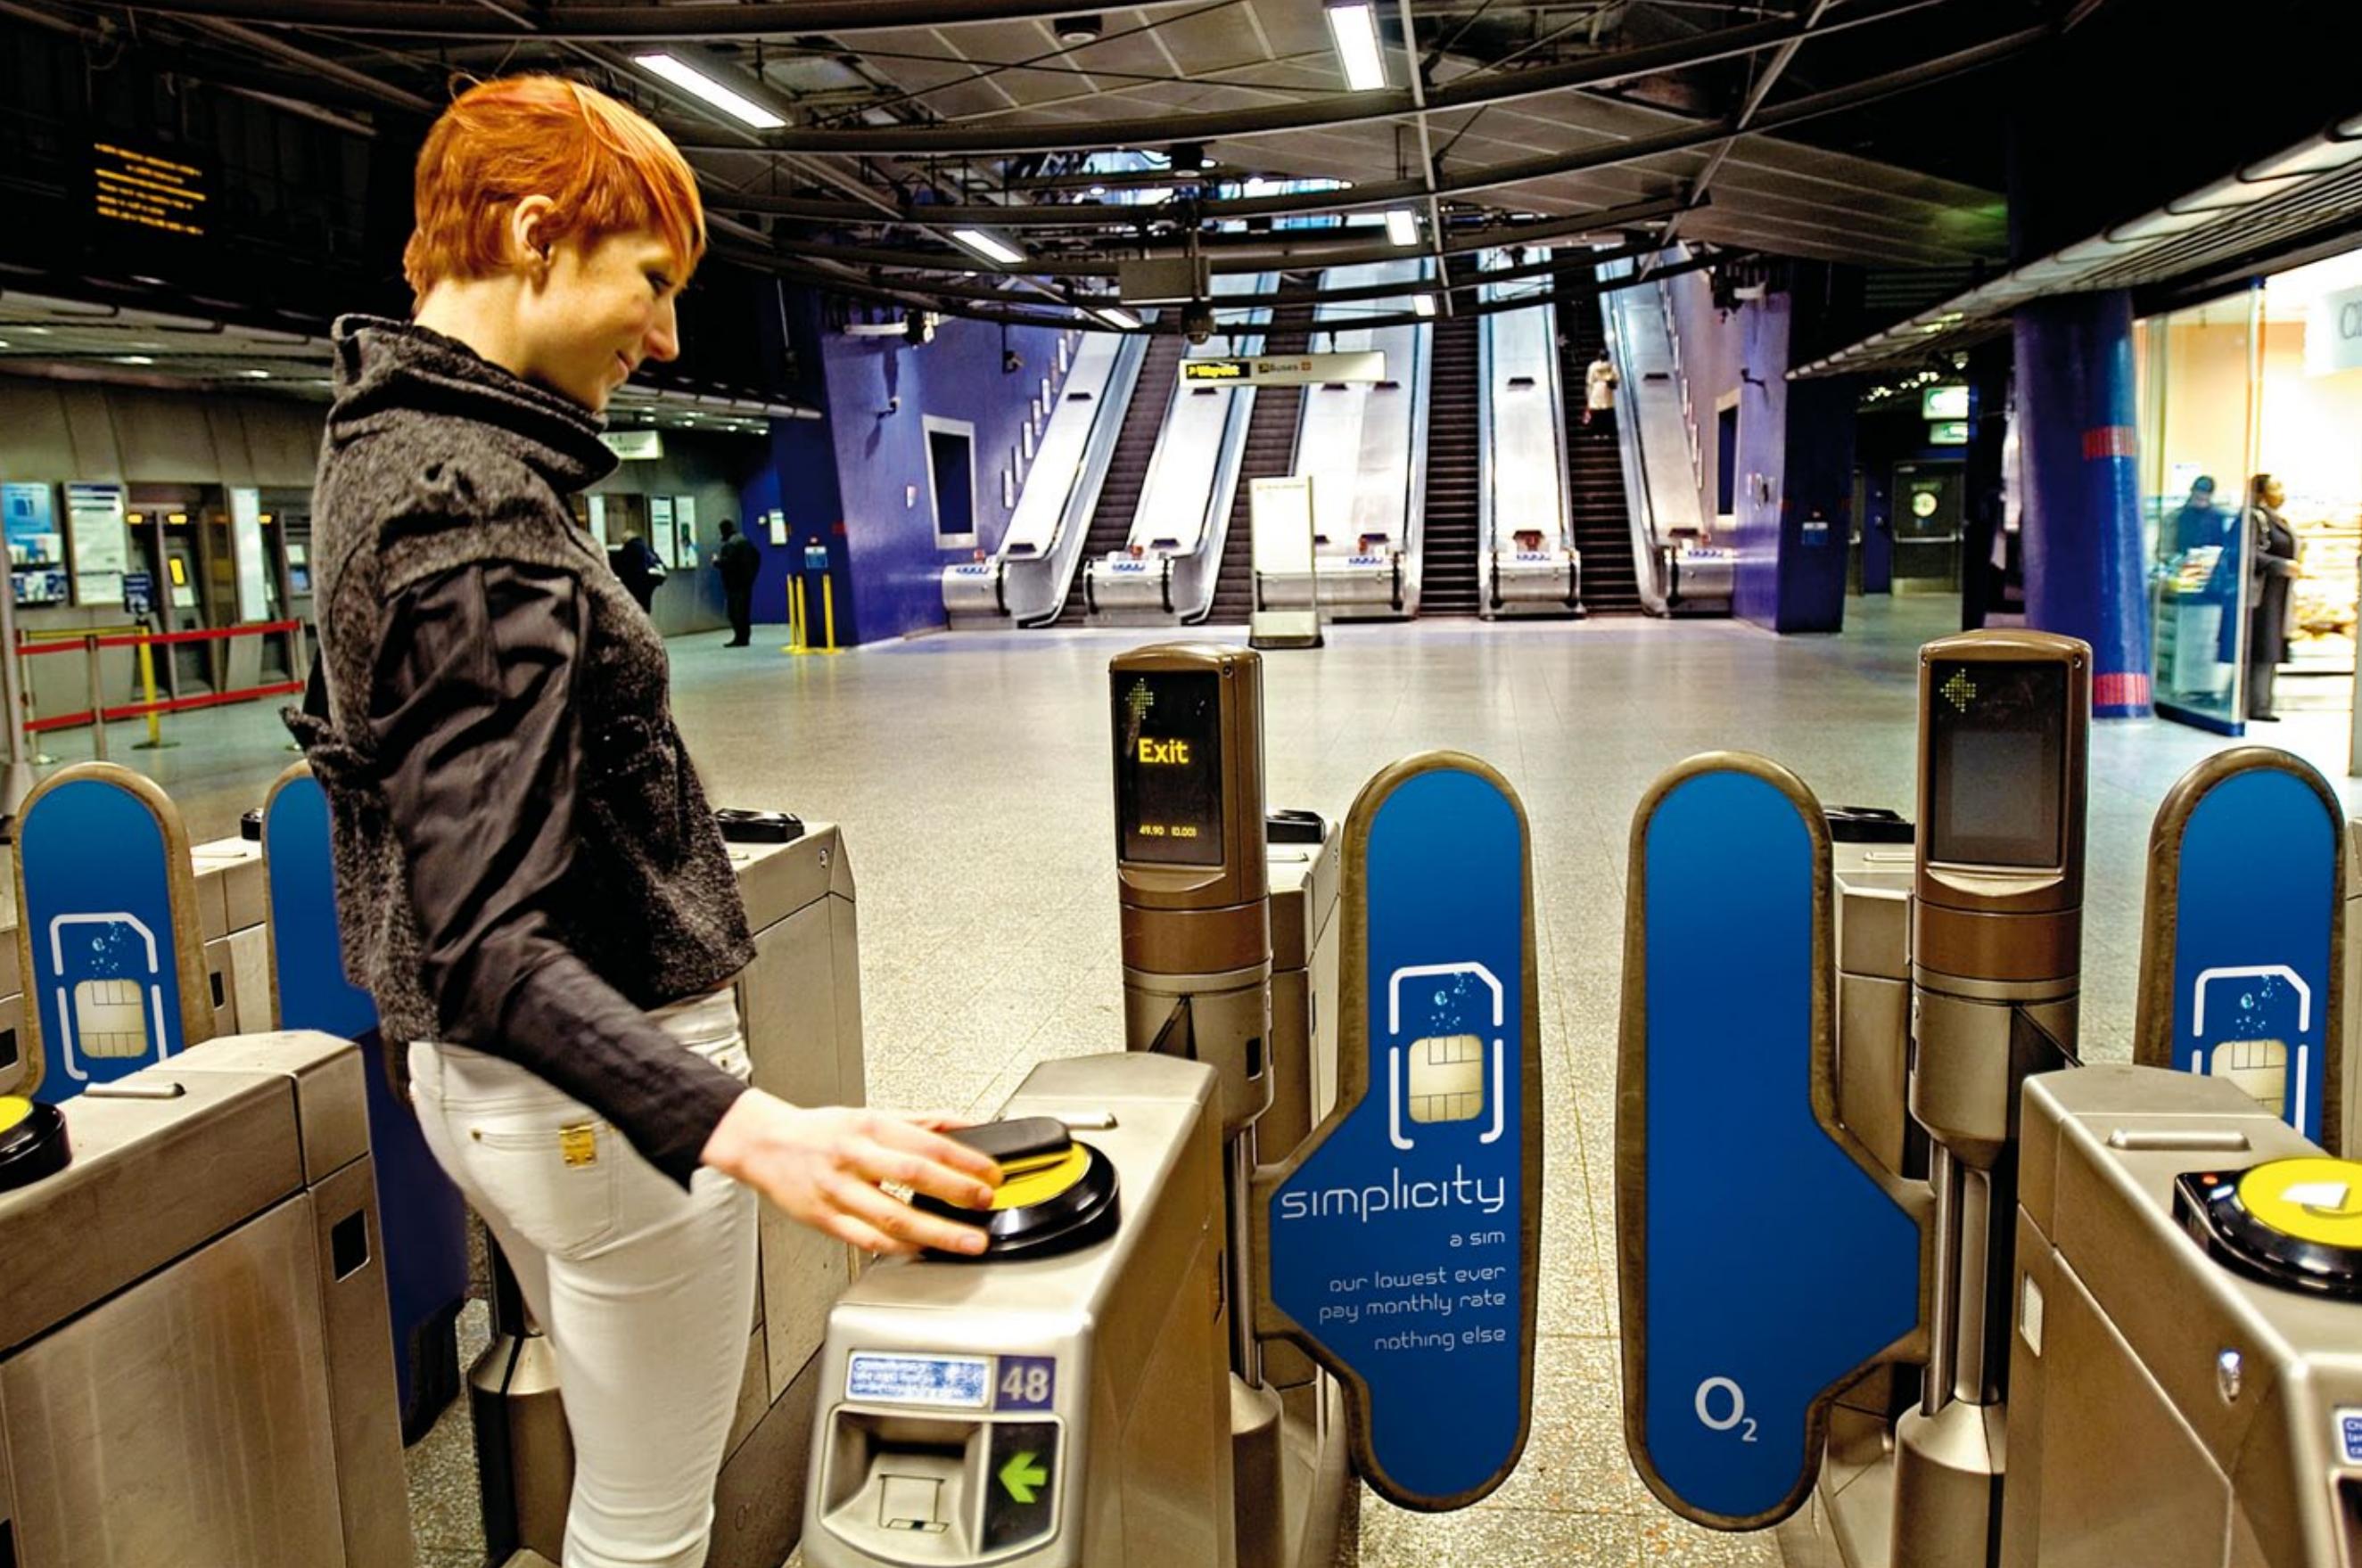 NFC public transportation smartphone